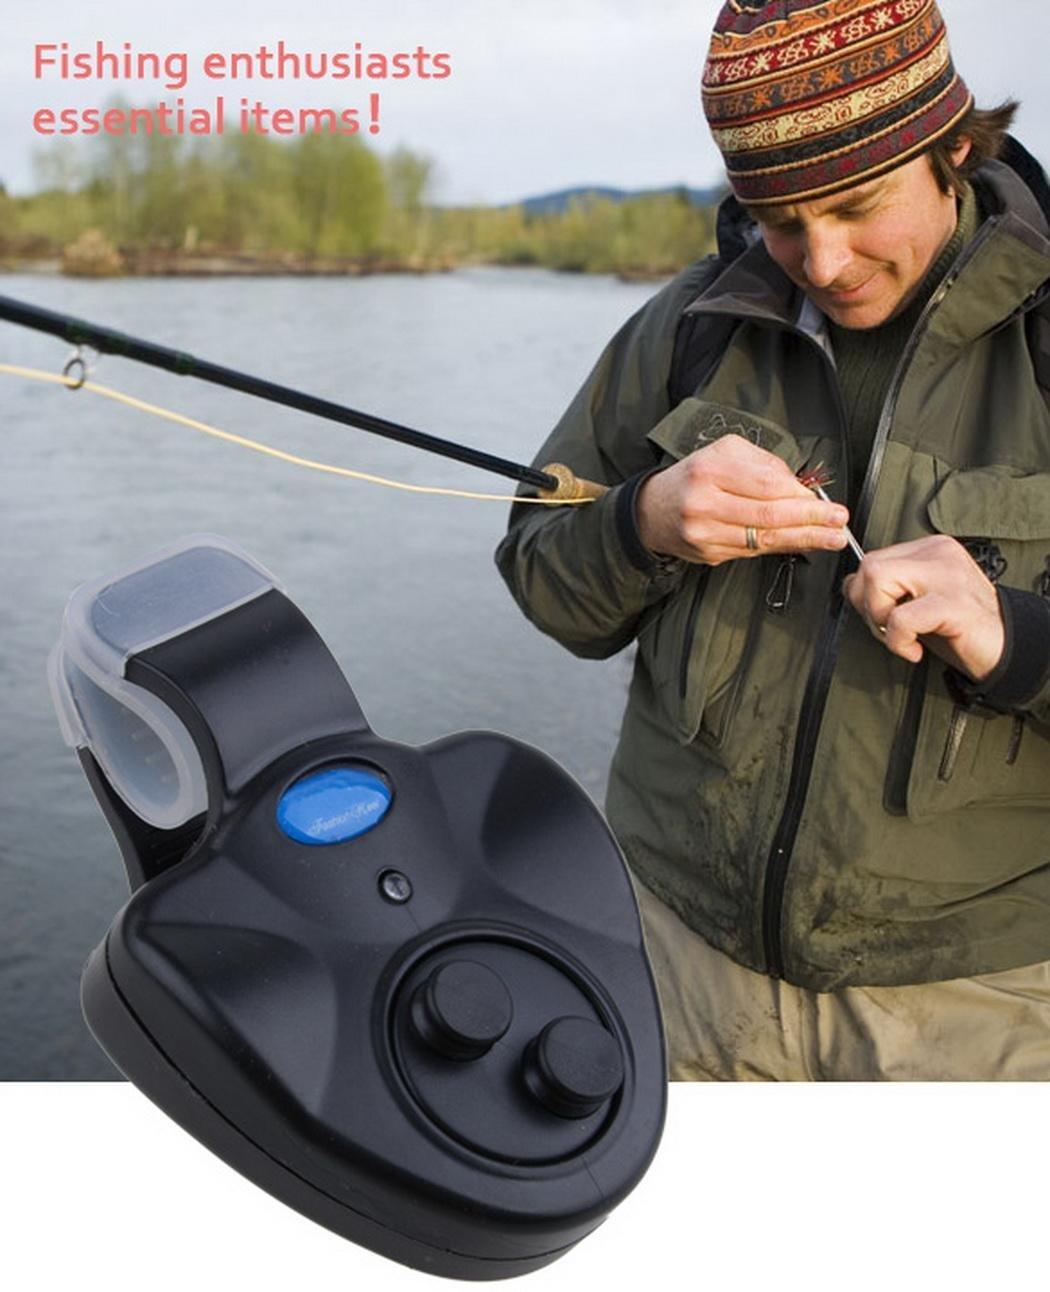 Fantiff incluida bater/ía de Timbre de Pescado Ca/ña de Pescar con luz LED para Exteriores Alarma electr/ónica de picada